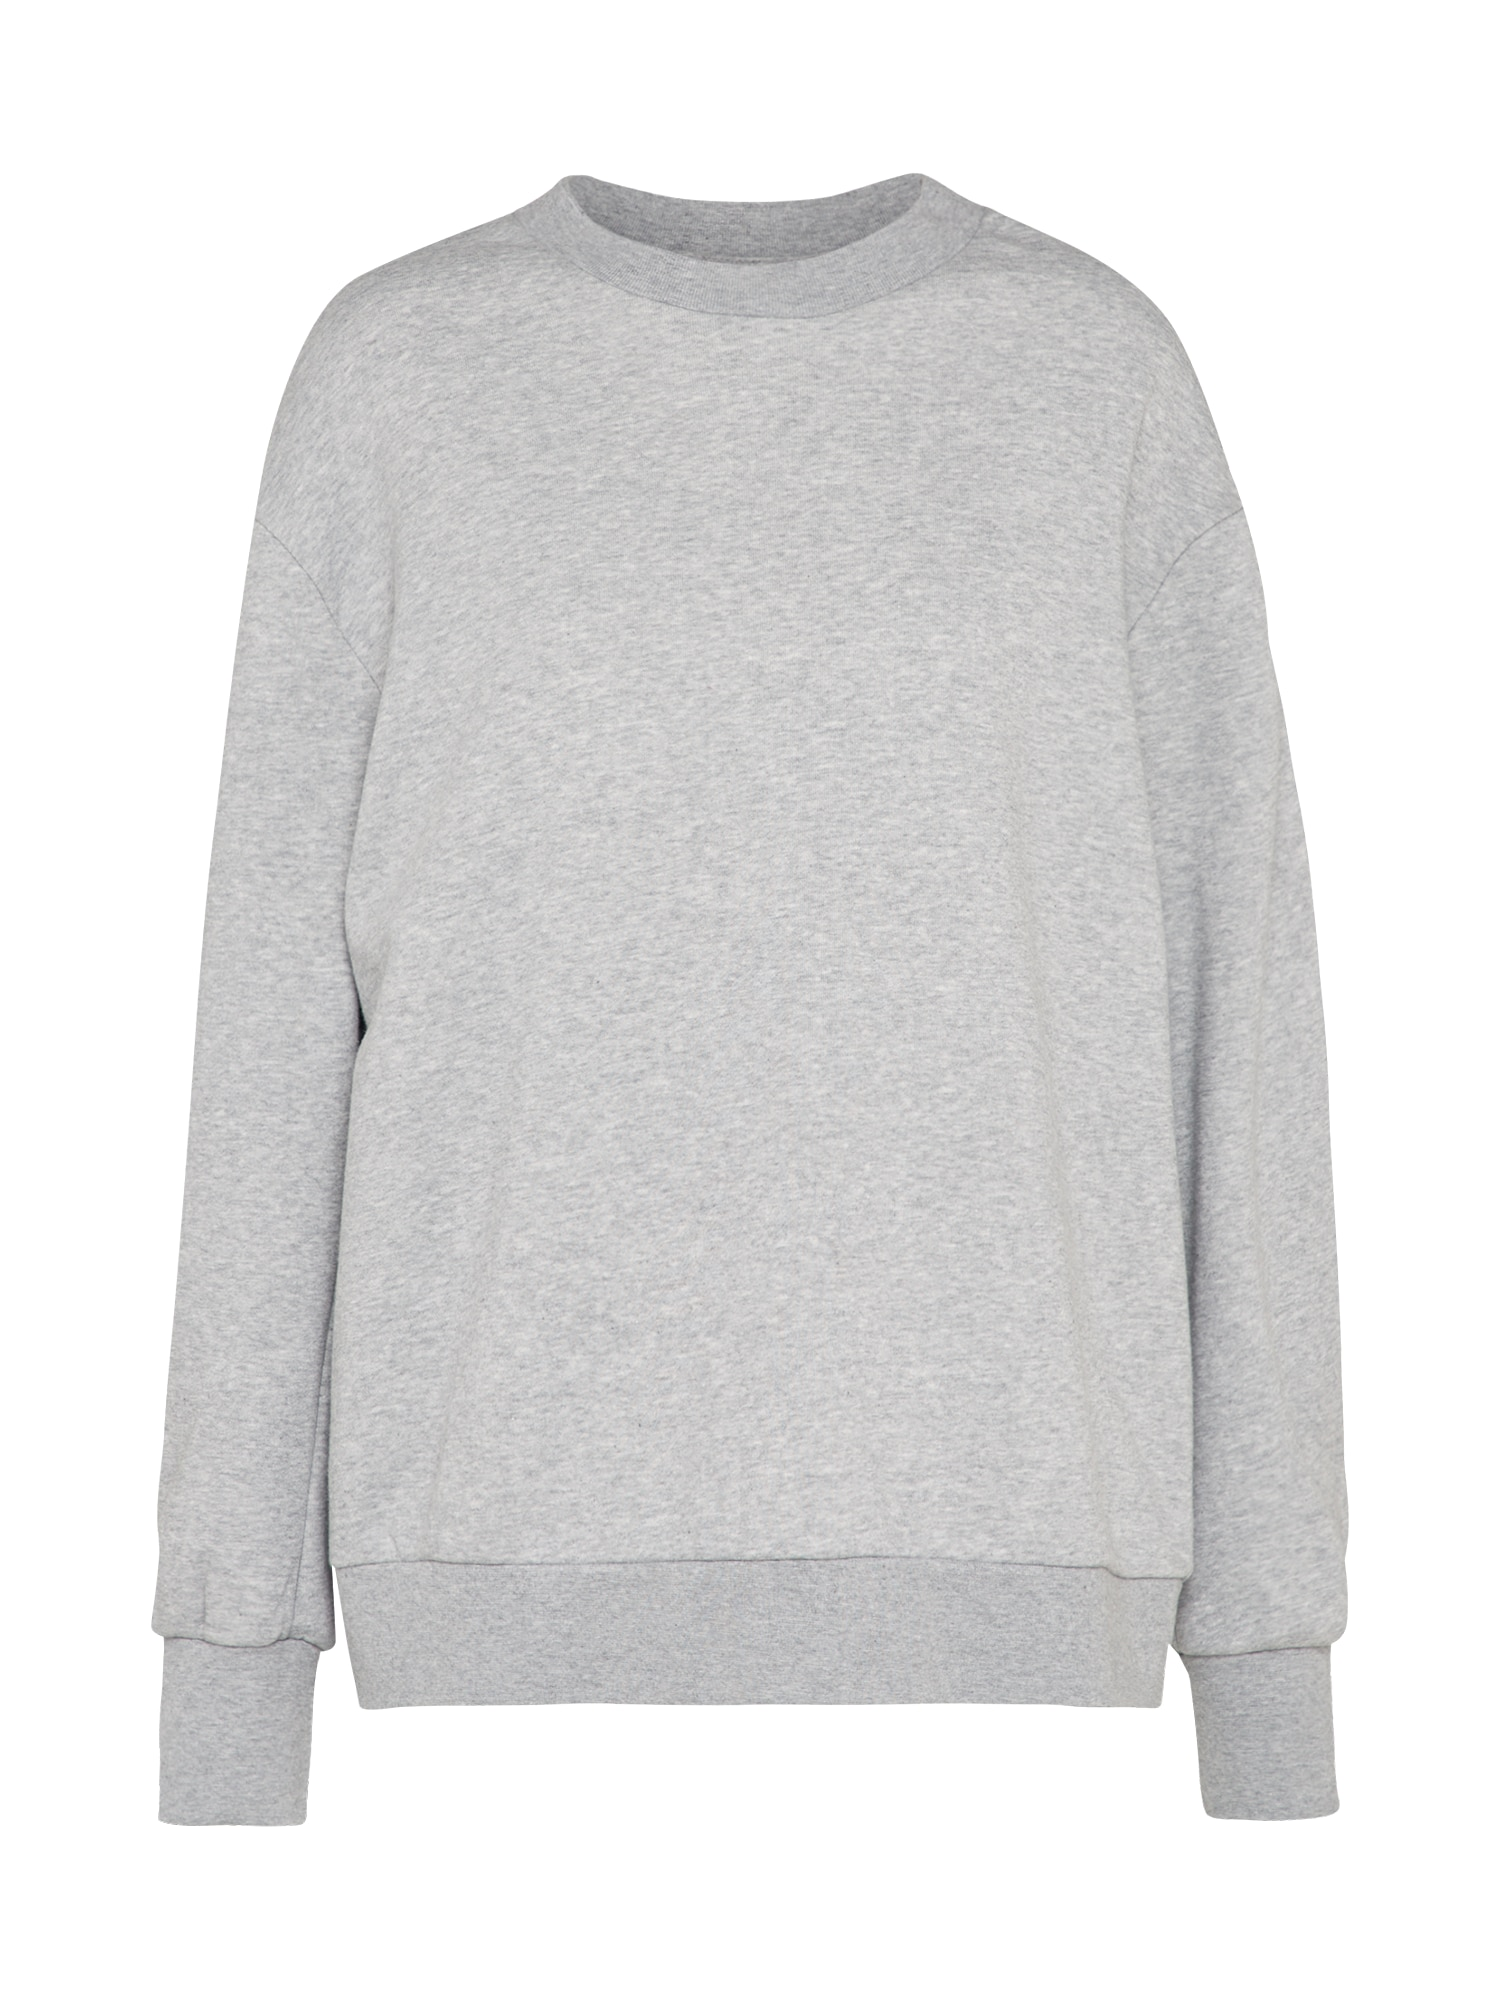 CHEAP MONDAY Dames Sweatshirt grijs